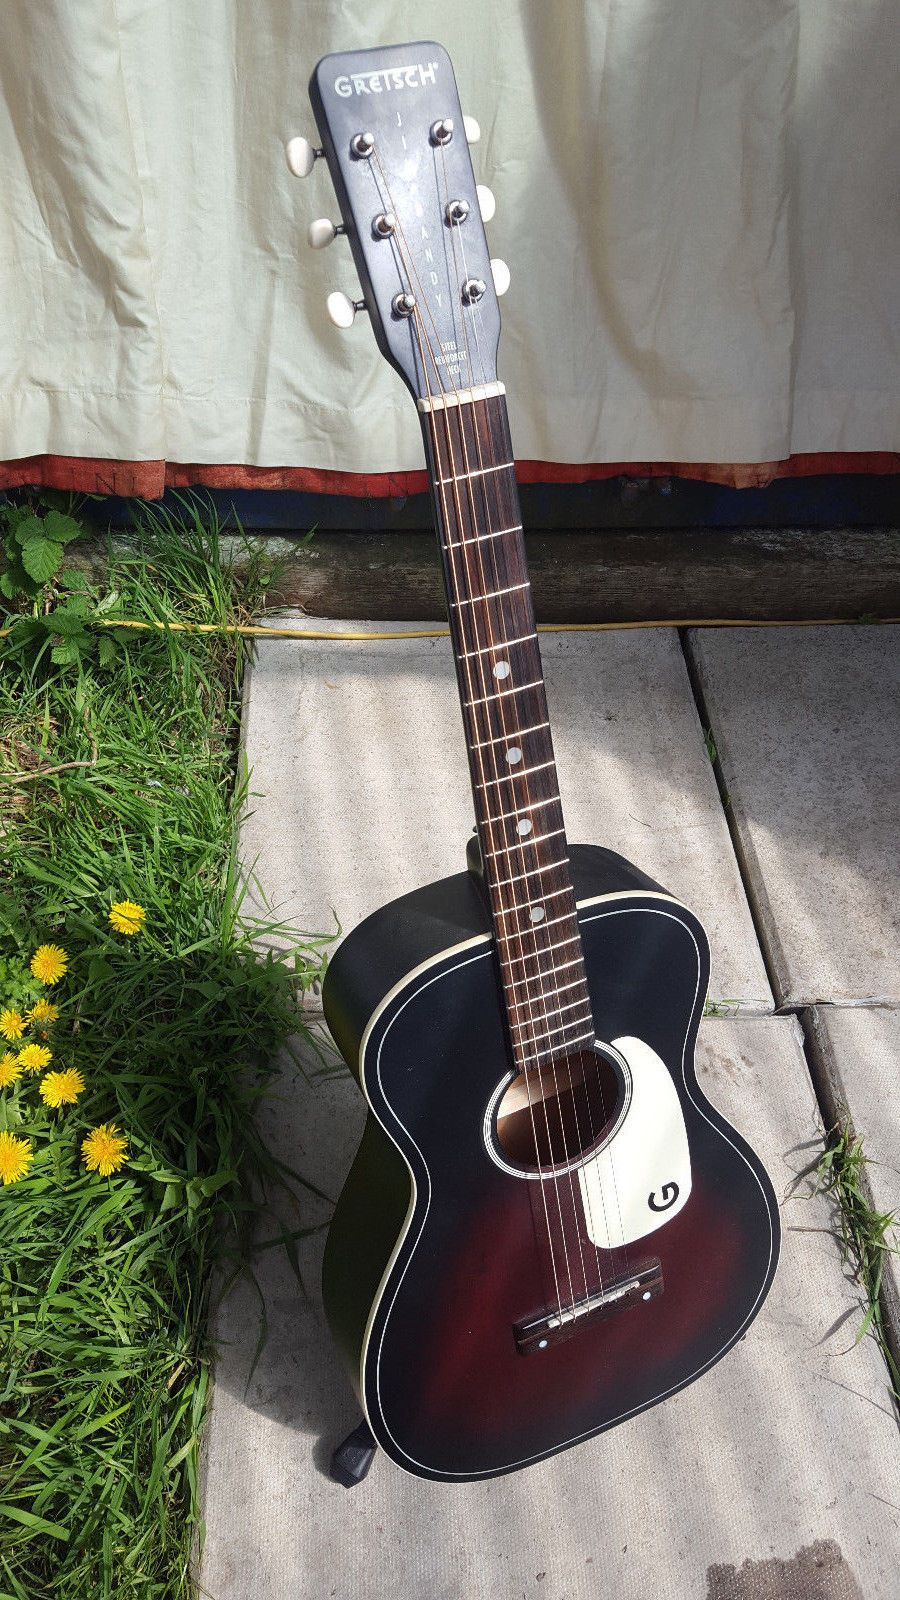 Gretsch Jim Dandy G9500 Acoustic Parlour Guitar Guitar Gretsch Guitars For Sale